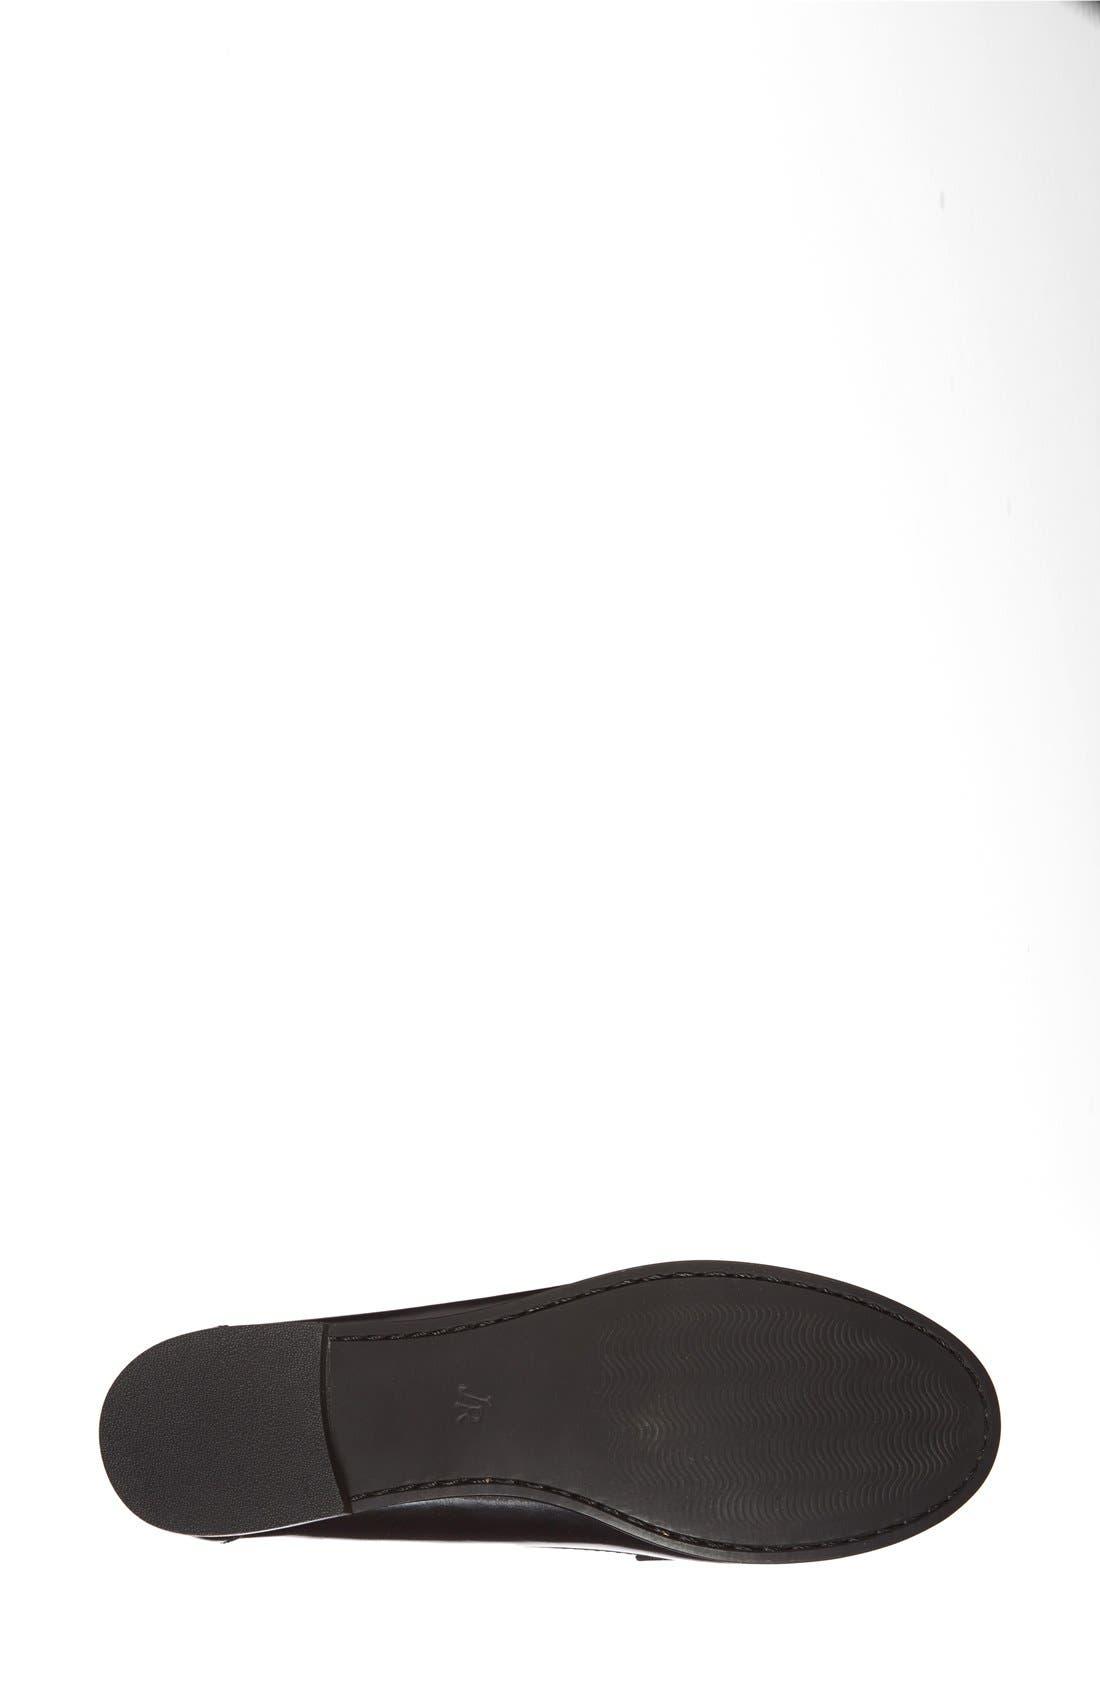 Alternate Image 4  - Jack Rogers 'Quinn' Leather Loafer (Women)